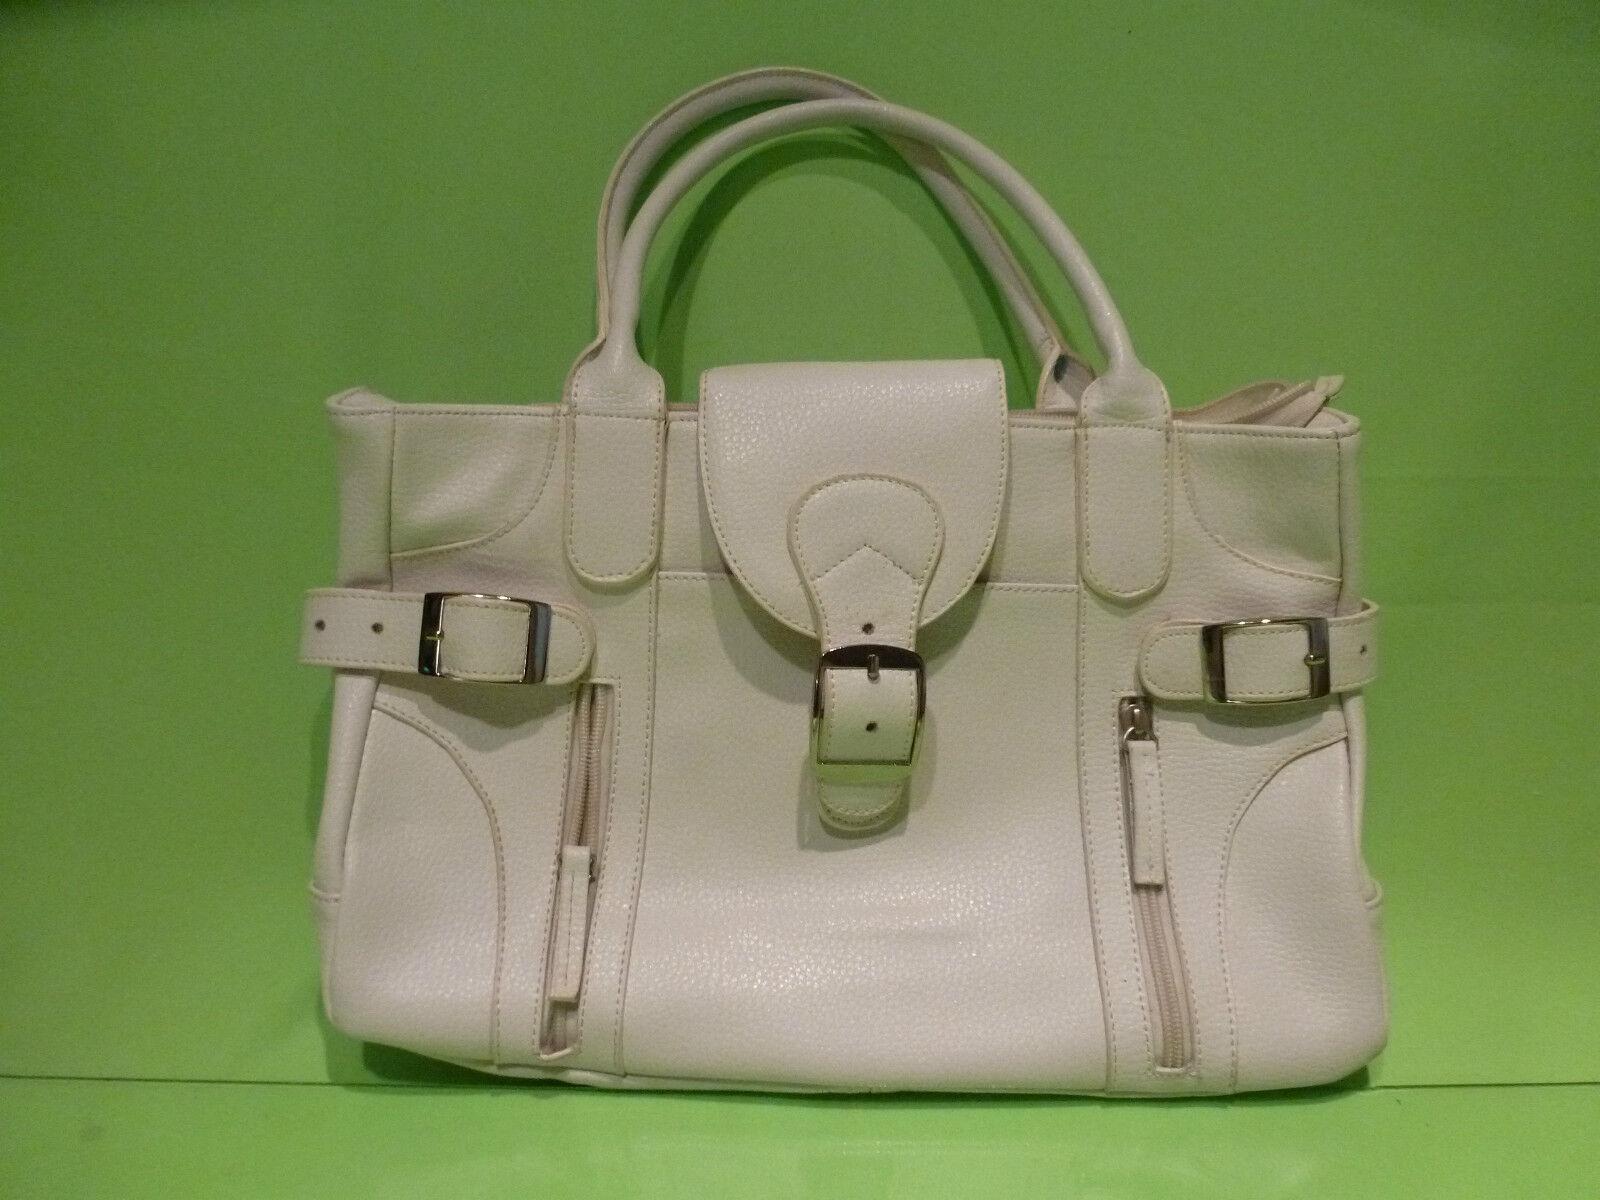 blanc LEATHER BAG - VINTAGE BAG -  EXTREMELY  RARE .